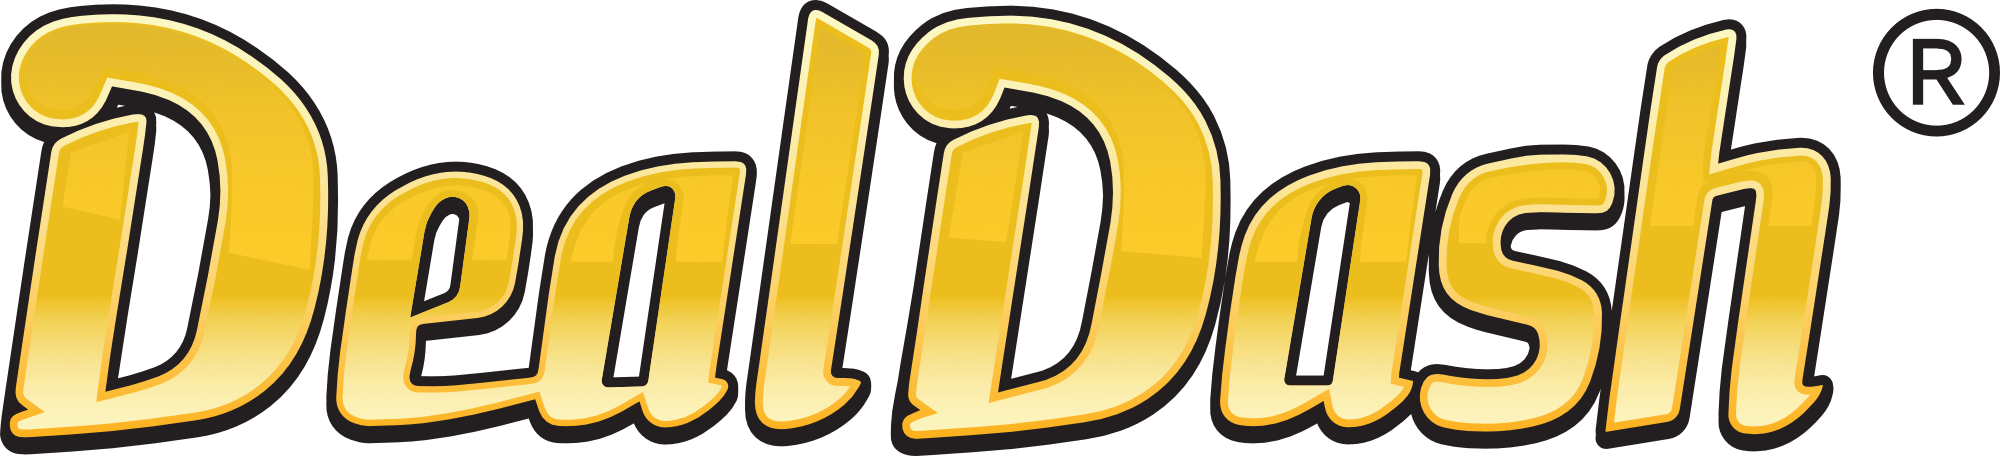 DealDash-registered-logo